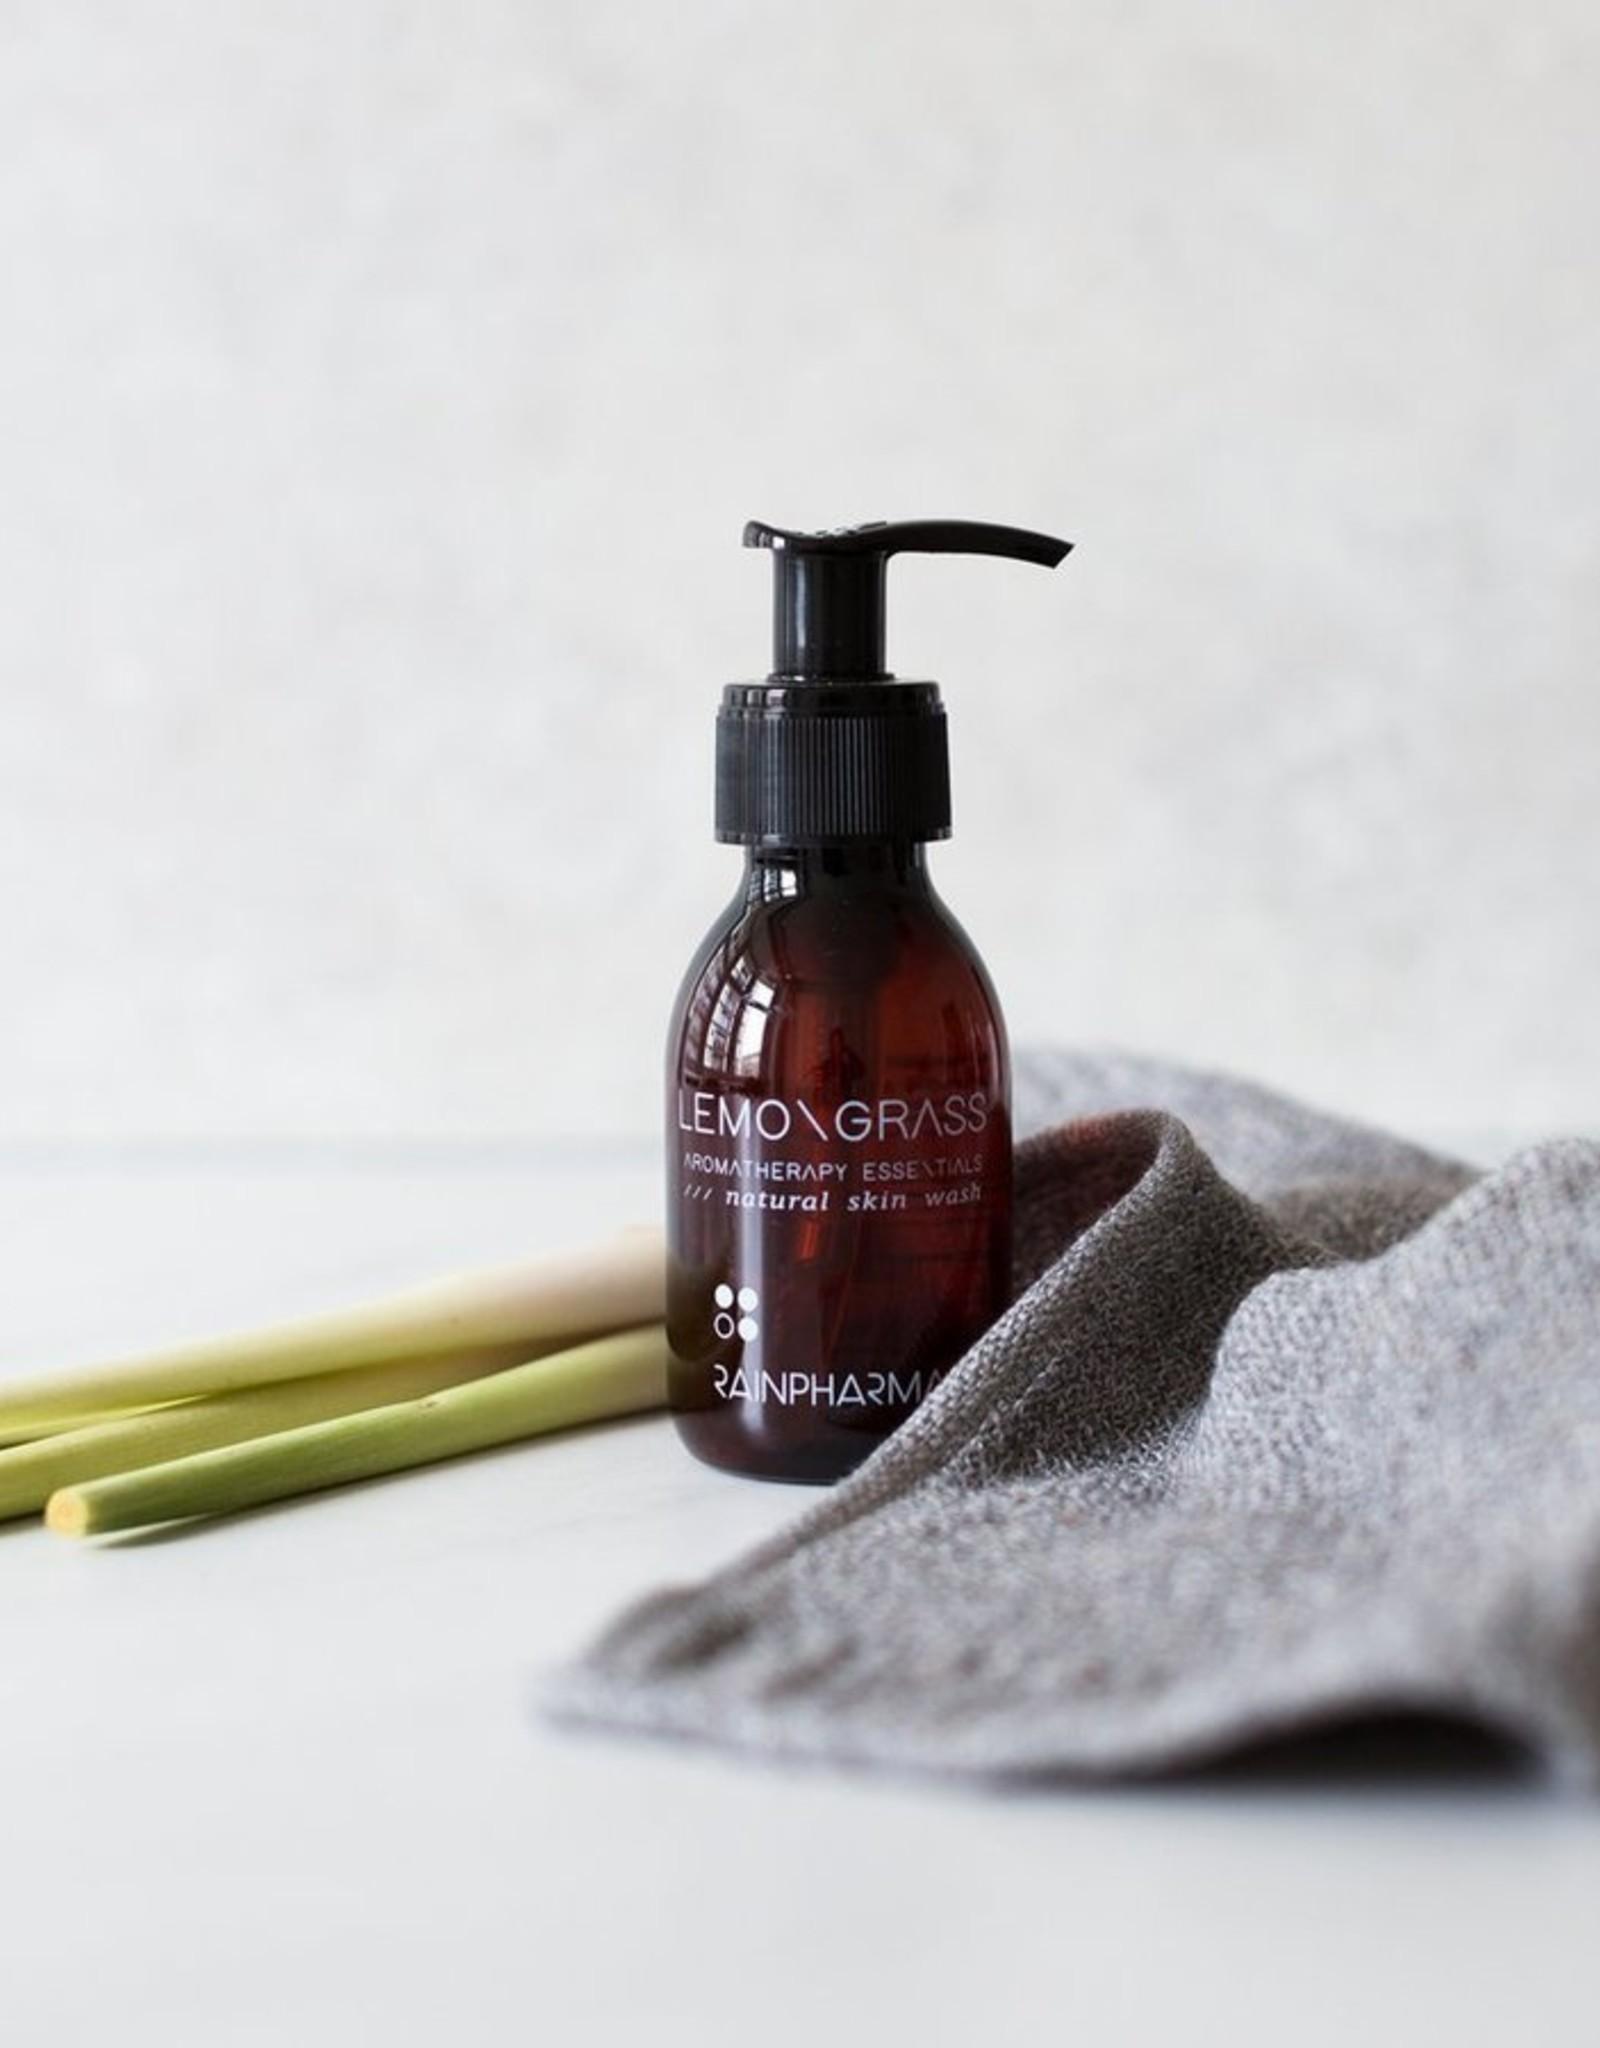 RainPharma Rainpharma - Skin Wash Lemongrass 60 ml (reisformaat)